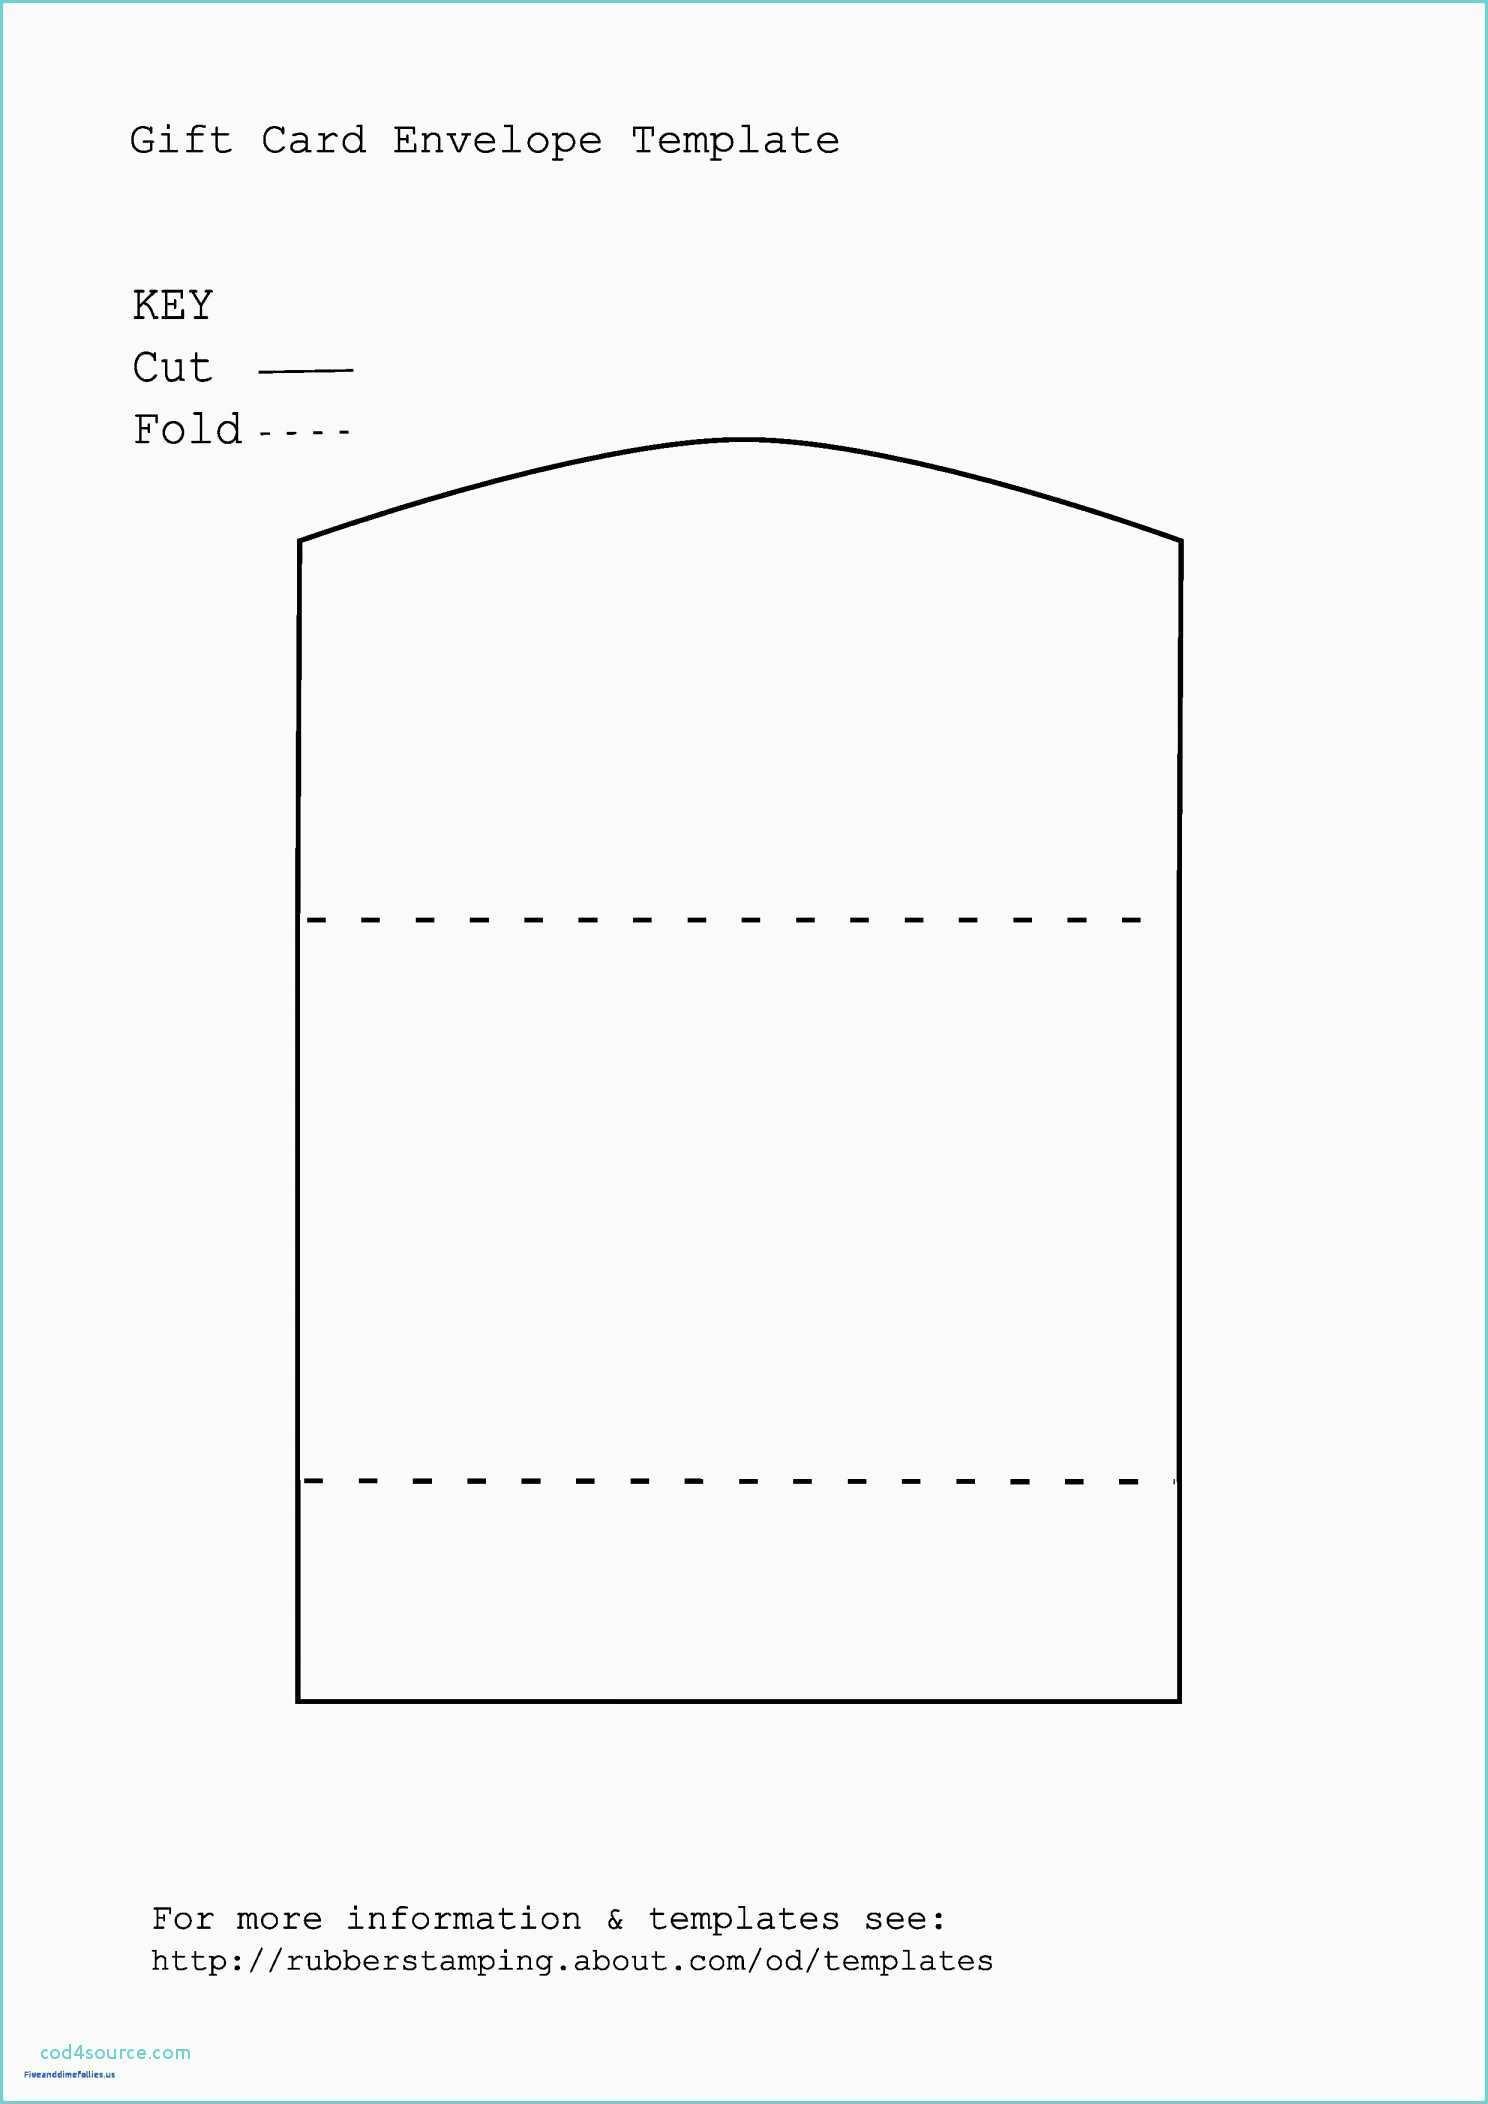 Inventory Spreadsheet Template Google Docs For Google Sheets Templates Inventory Google Docs Calendar Spreadsheet